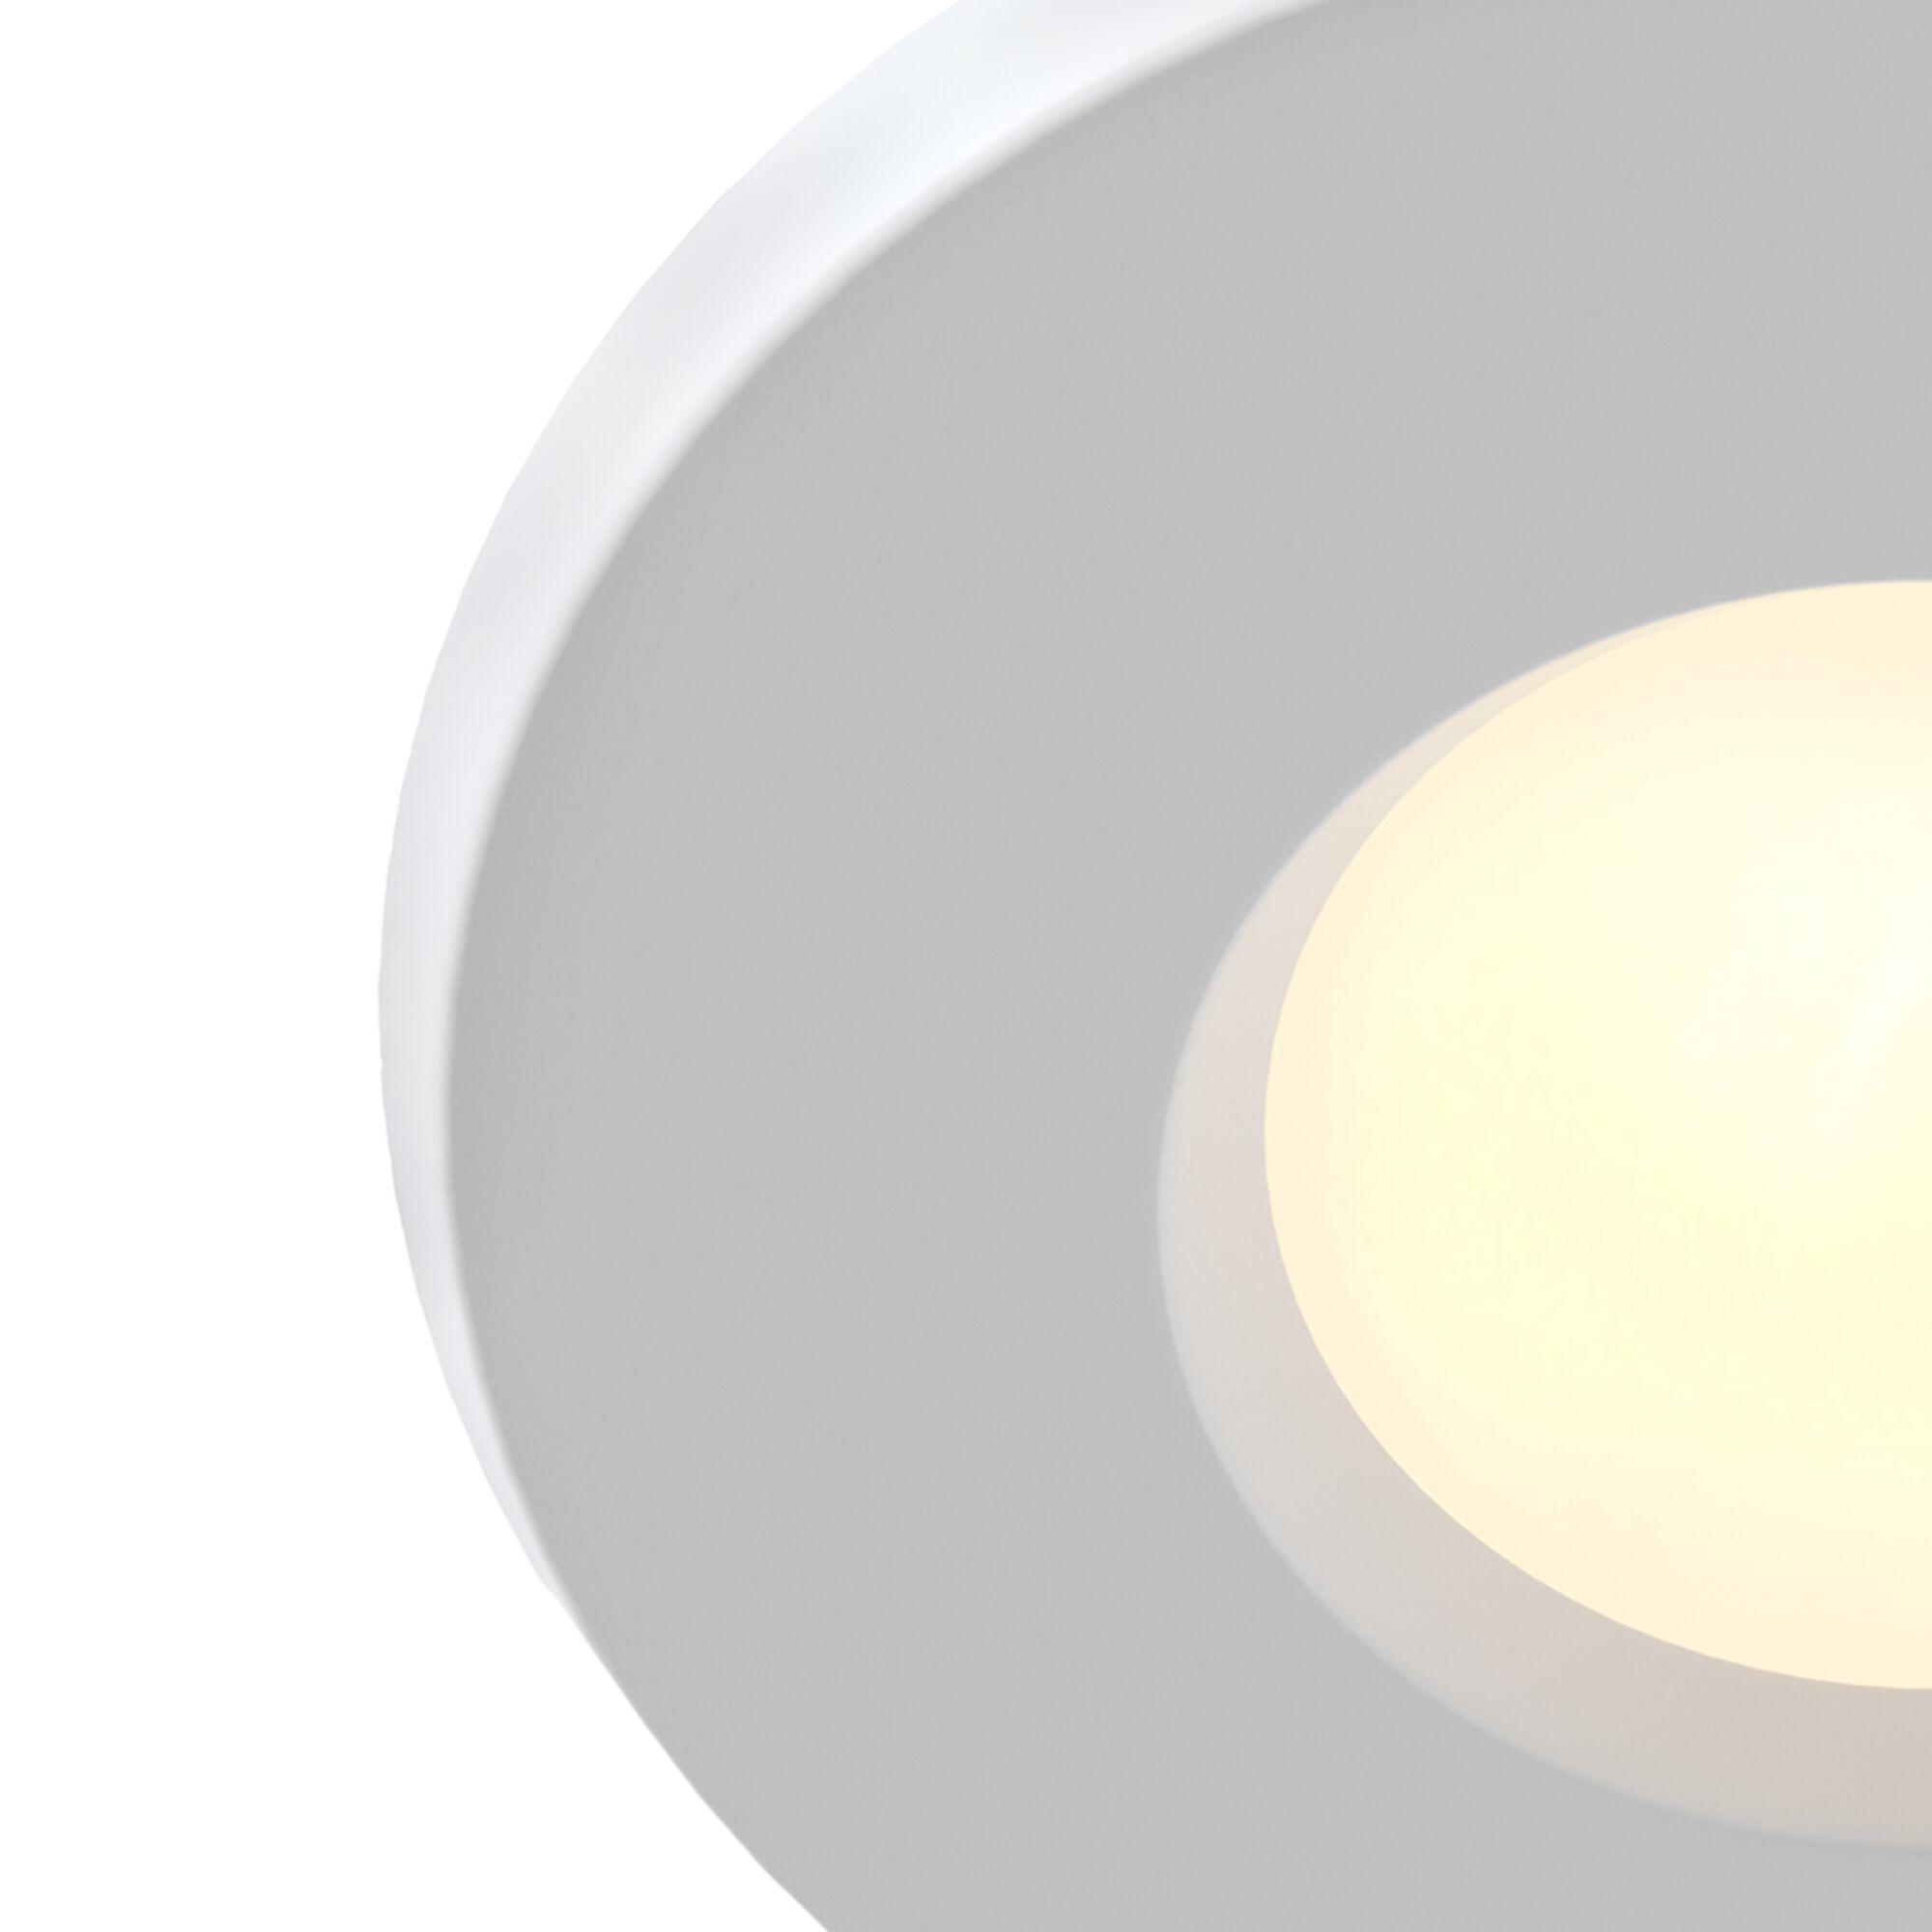 Встраиваемый светильник Maytoni Metal Modern DL010-3-01-W, 1xGU10x50W, белый, металл, стекло - фото 3